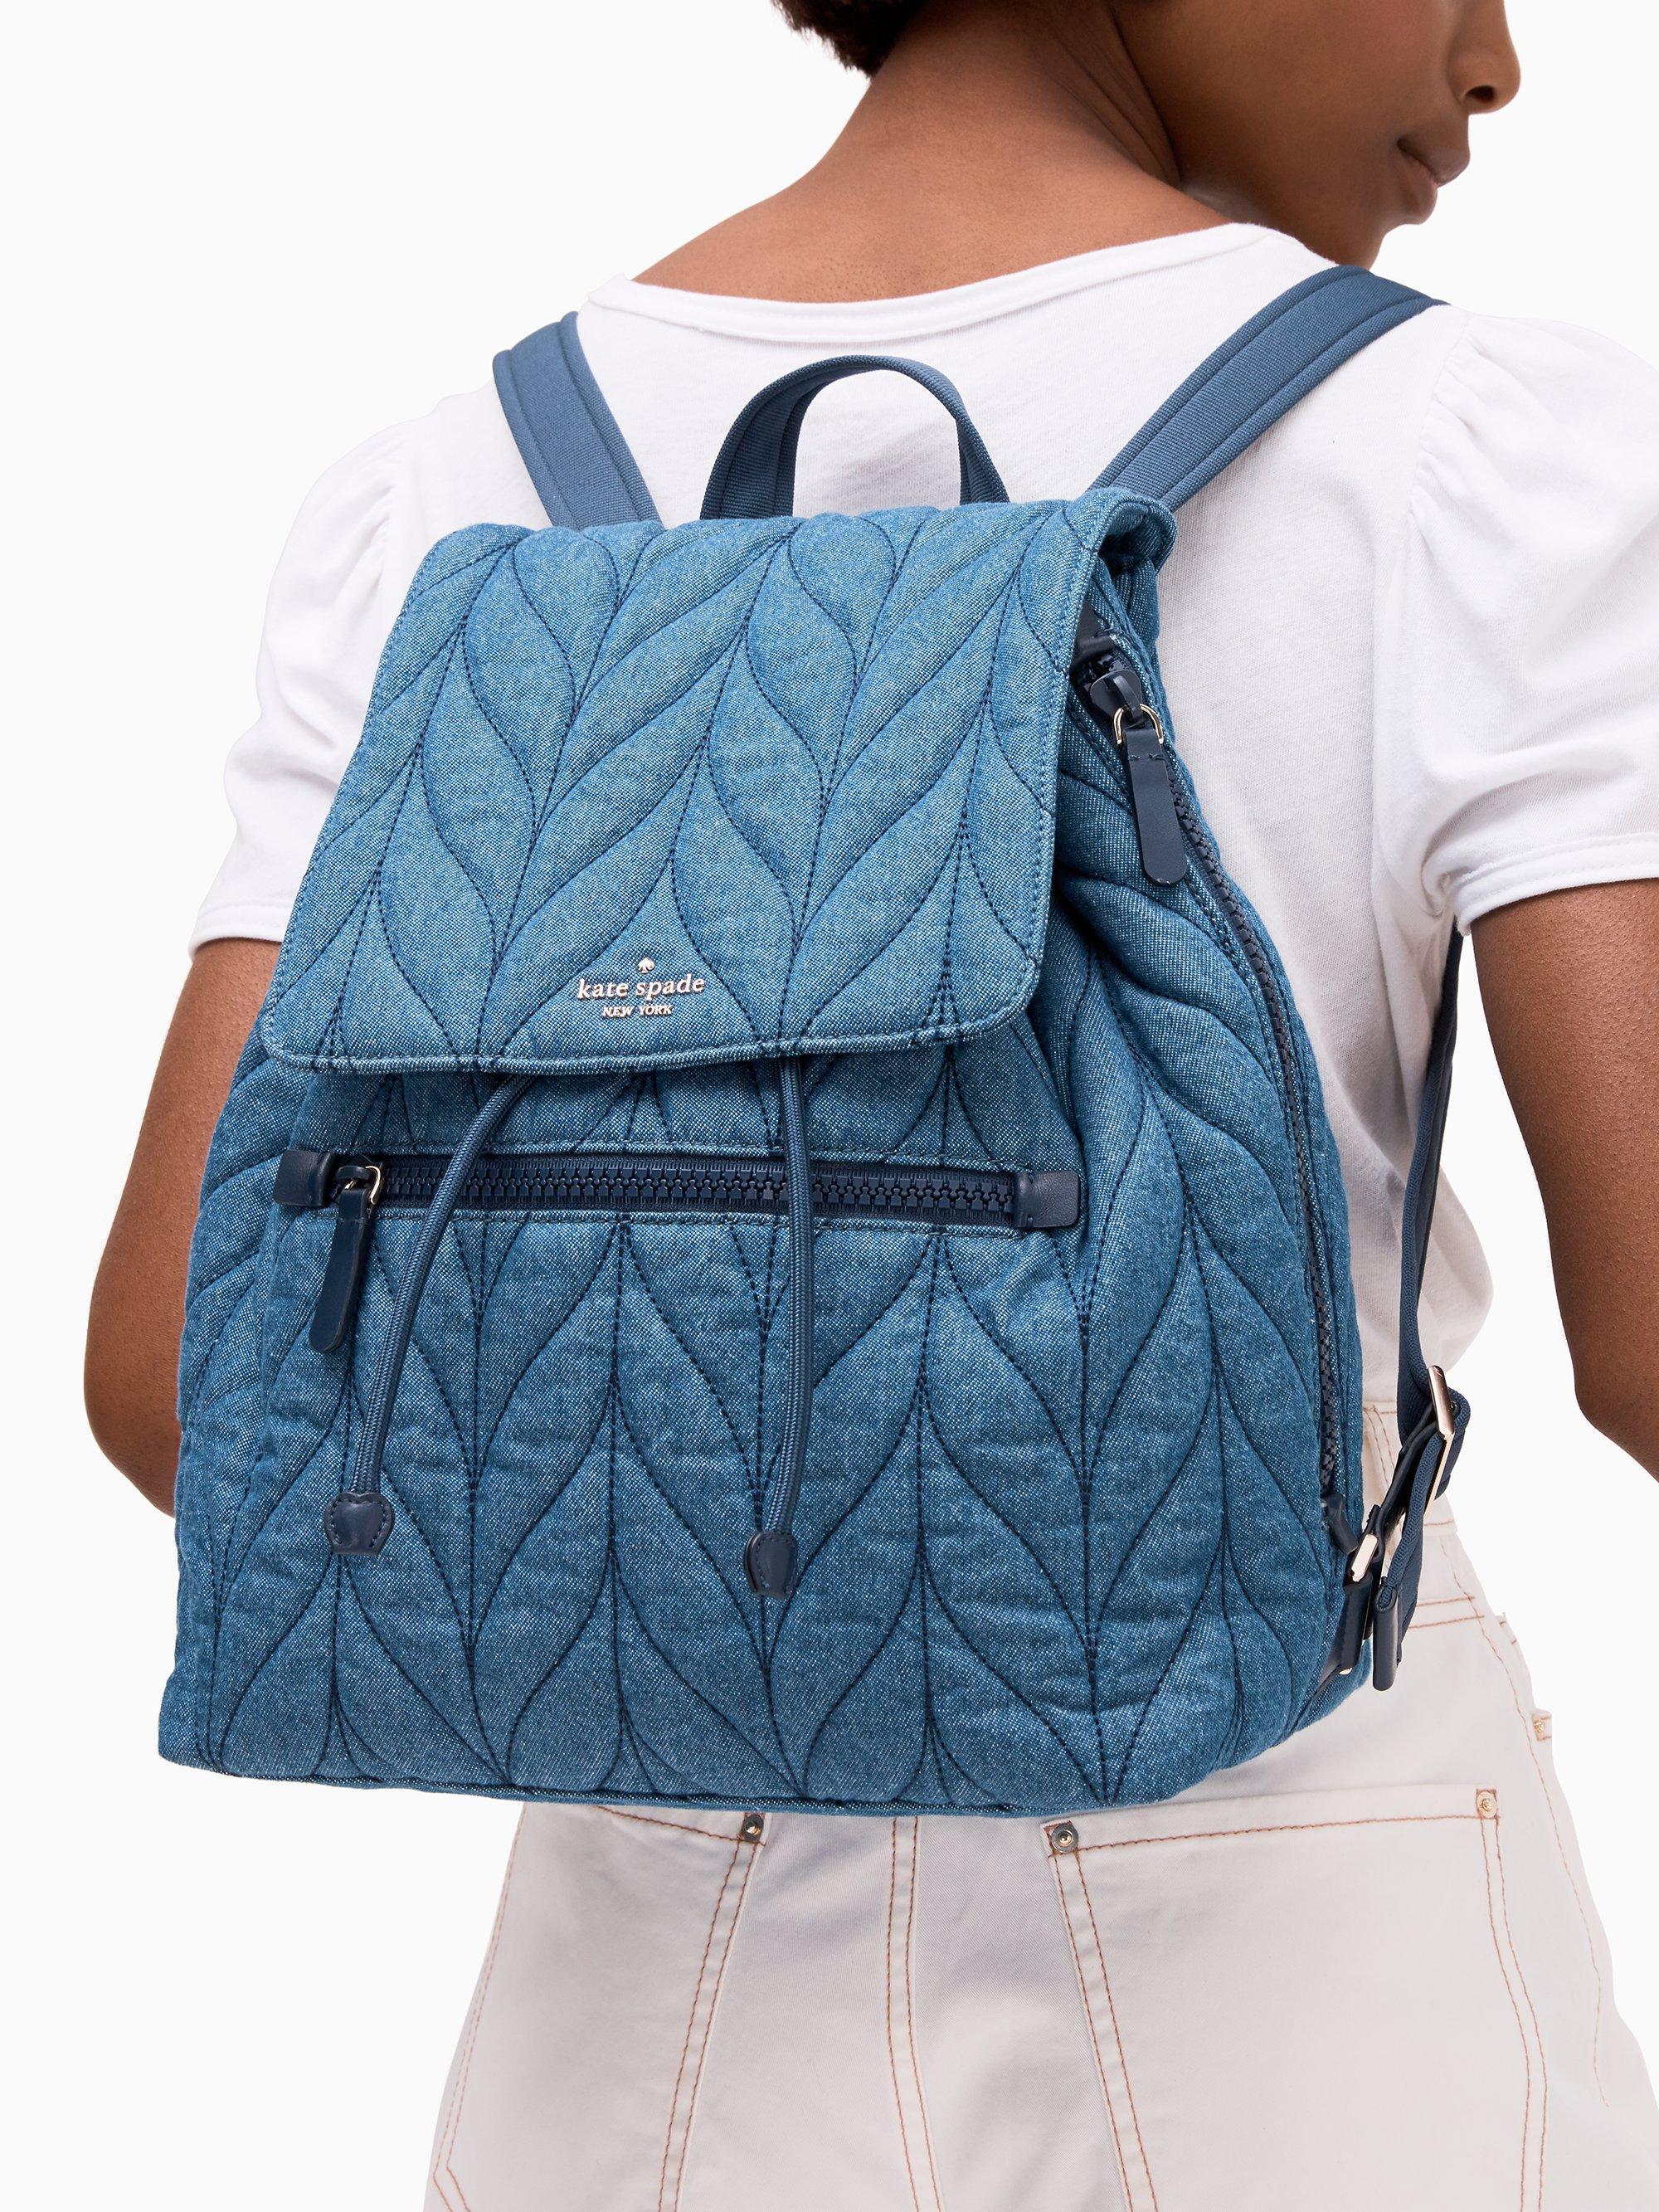 Kate Spade Ellie Denim Large Flap Backpack in Blue - Lyst